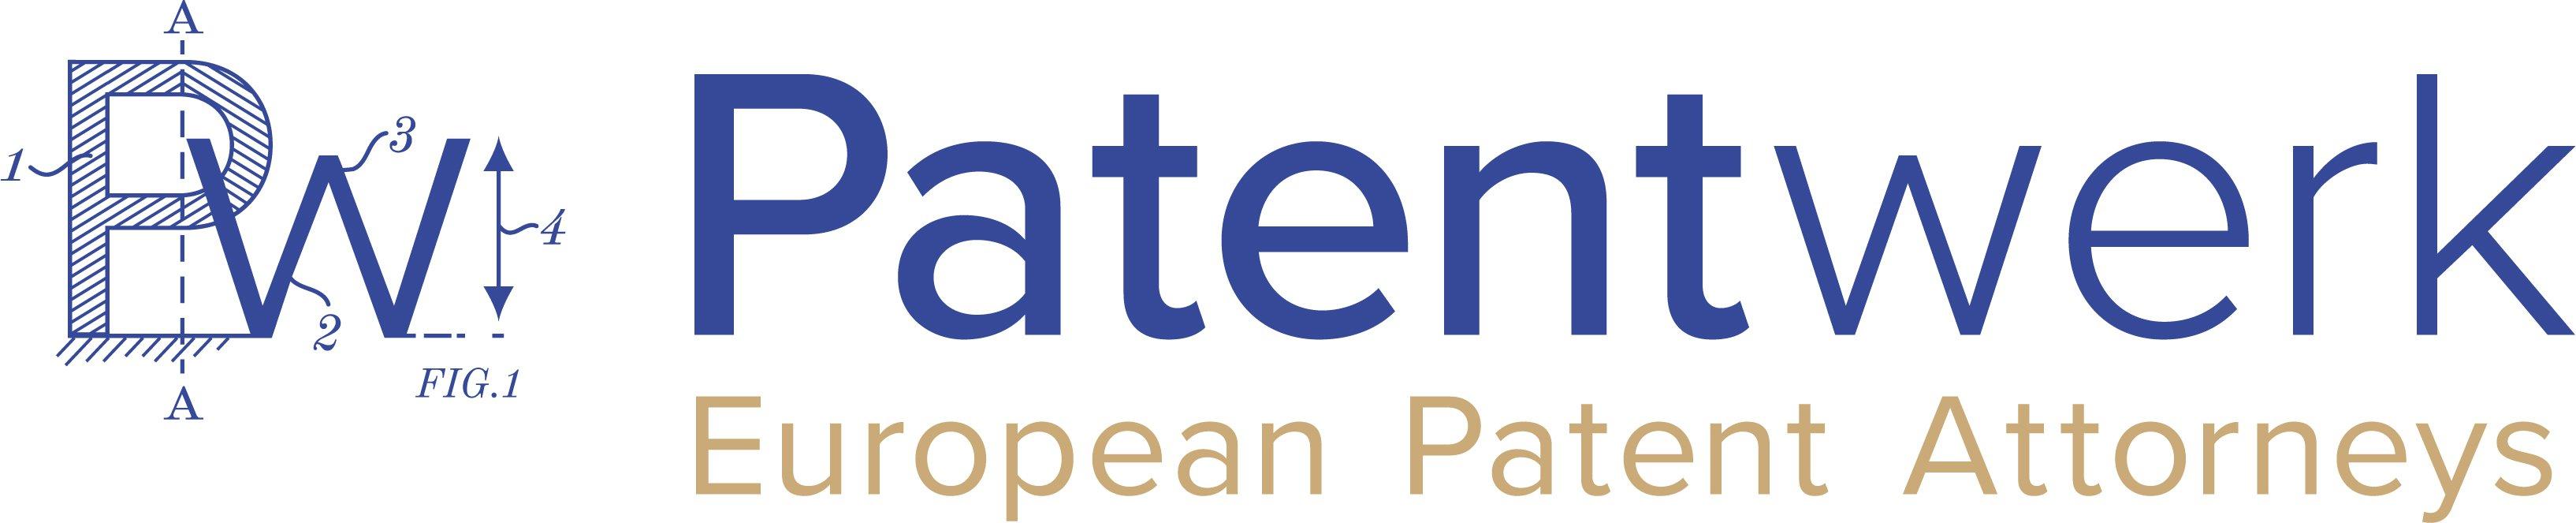 Patentwerk B.V.: Patent Engineer / Octrooigemachtigde in opleiding